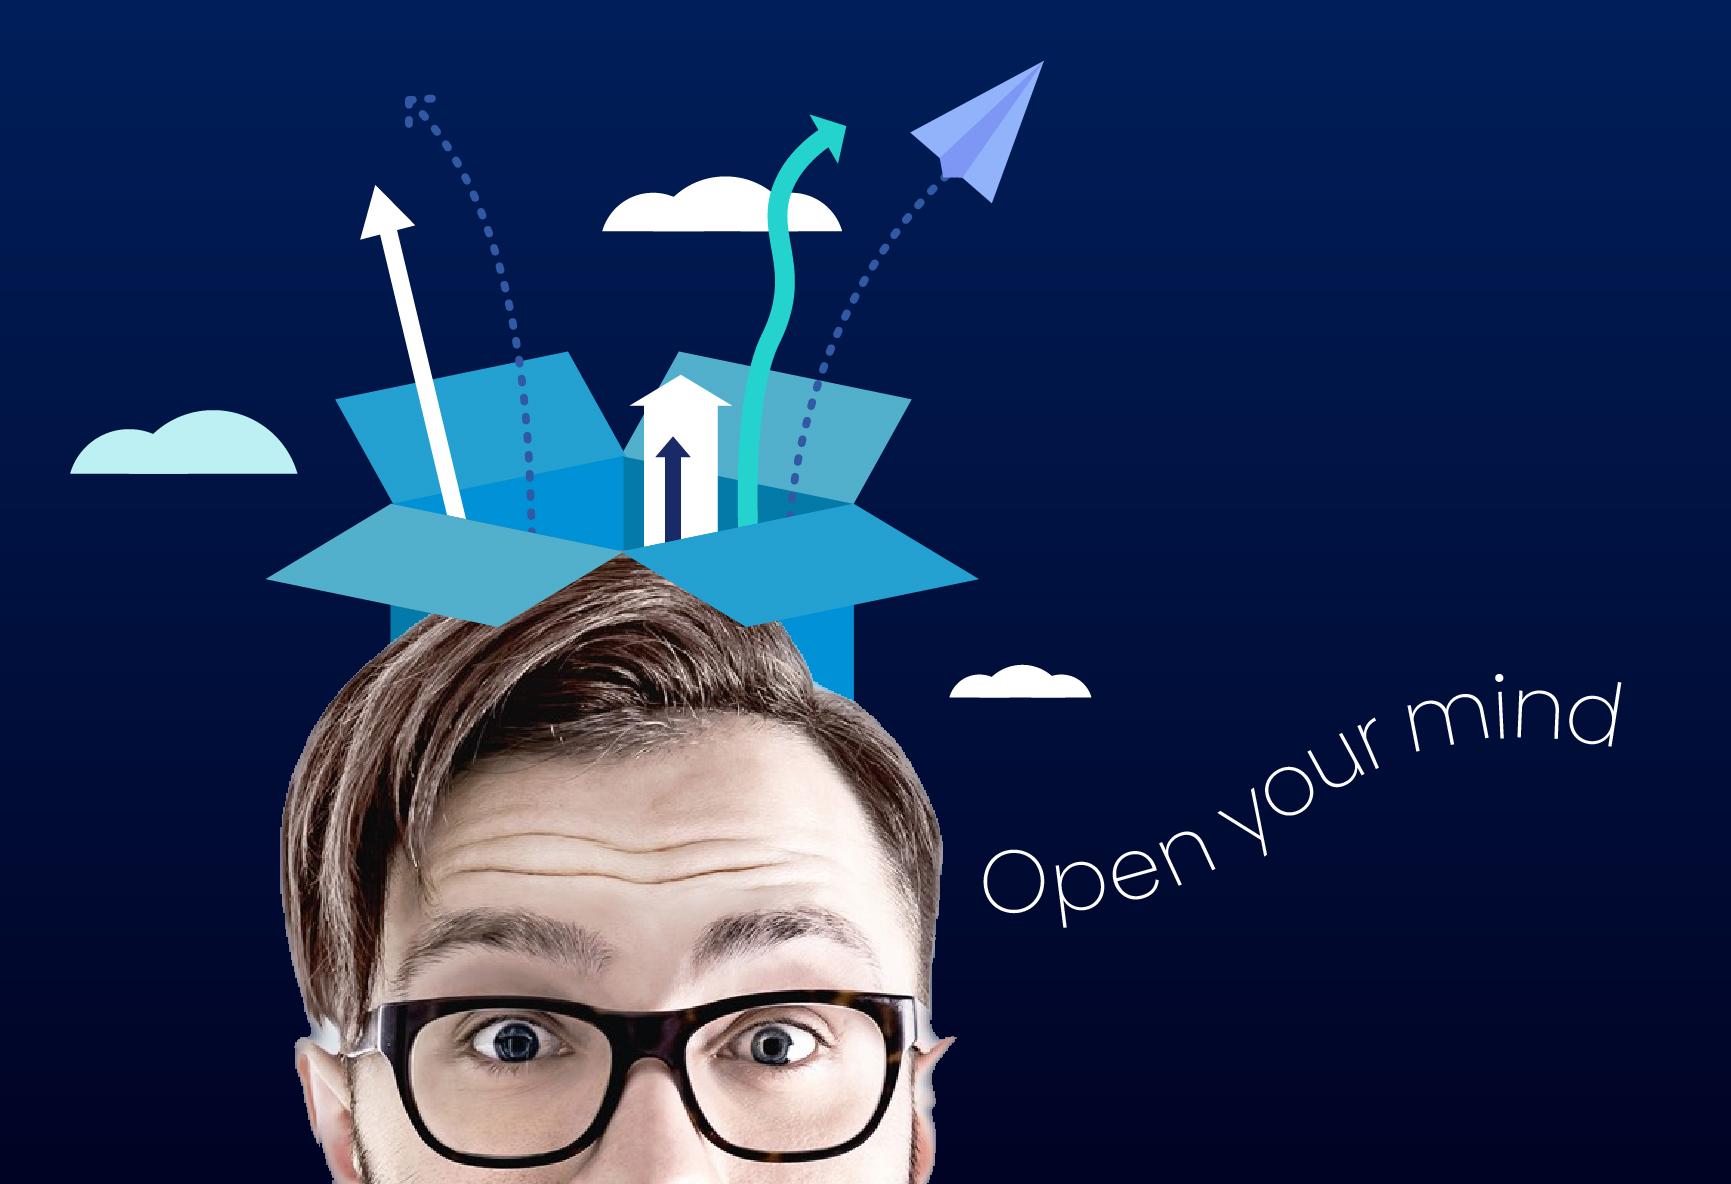 A.D. Creativity - open your mind